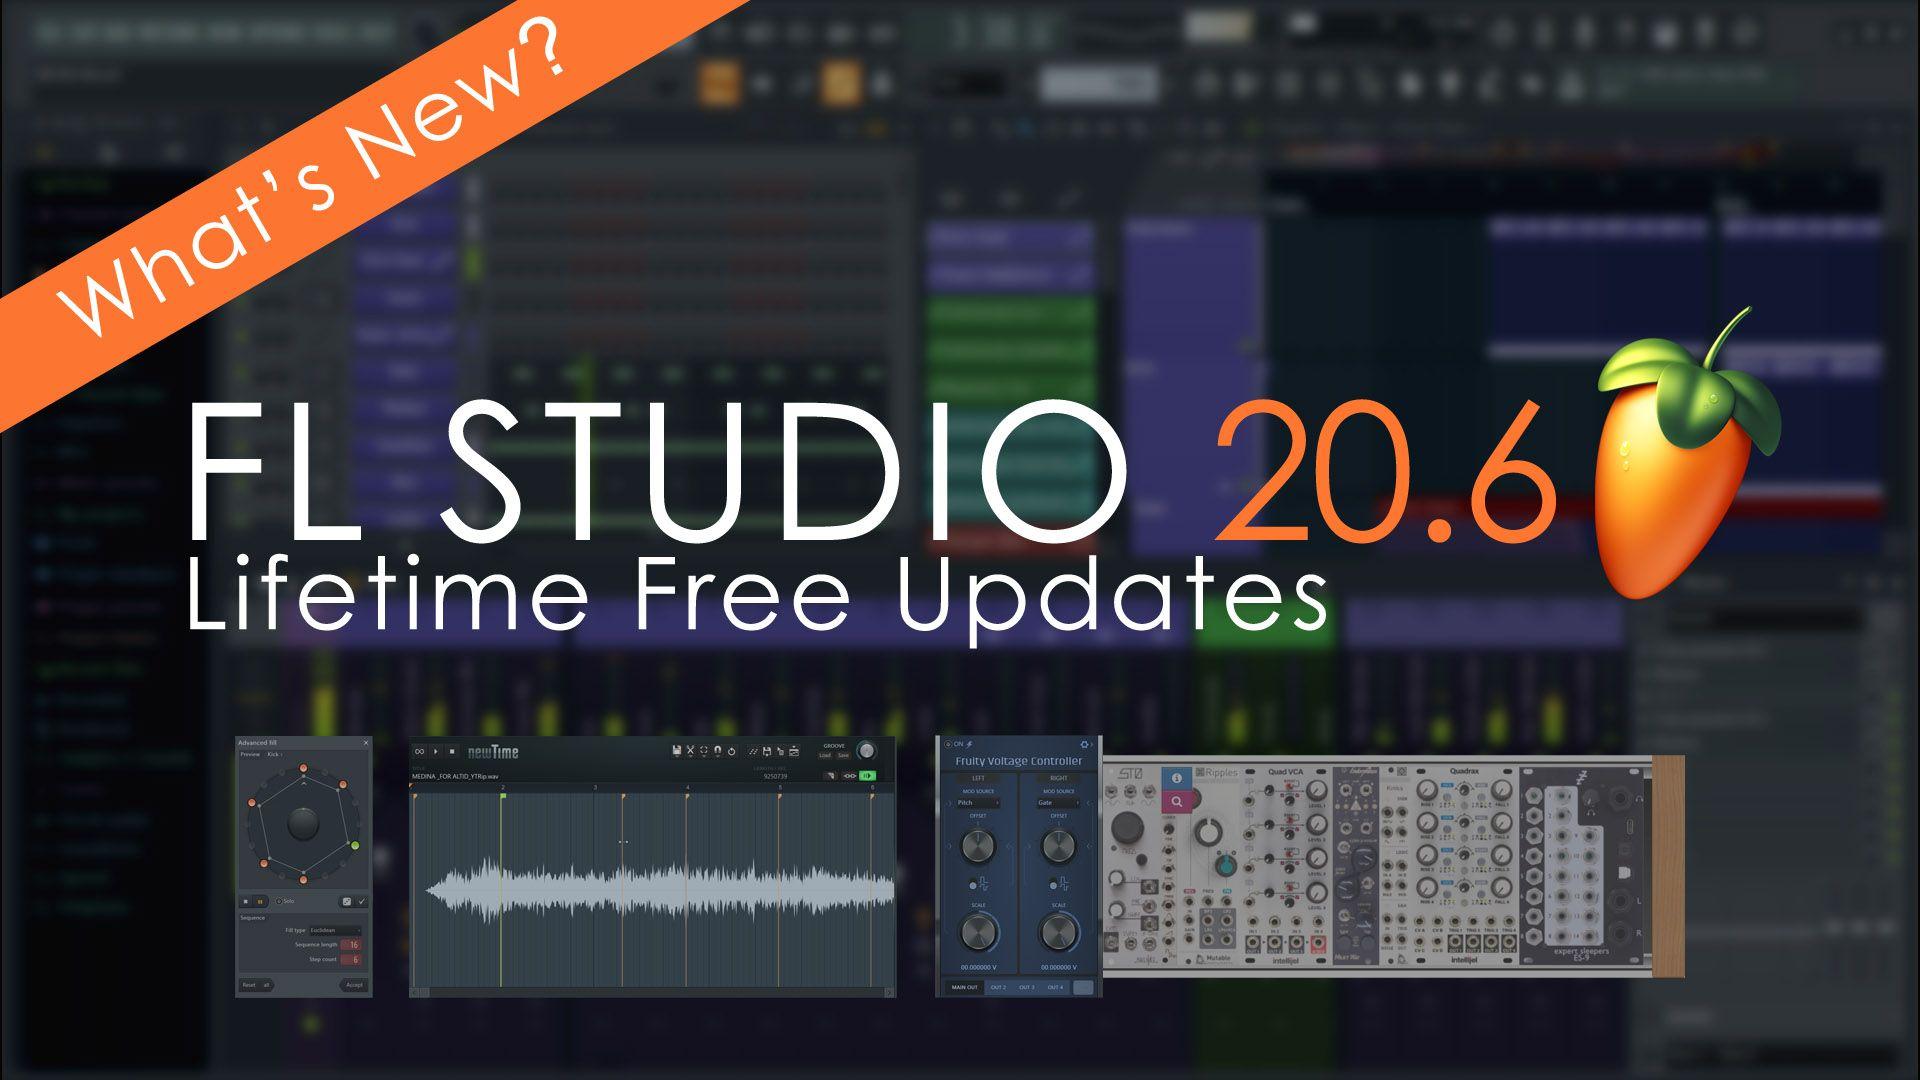 Image Line Launches Fl Studio 20 6 Distortion Amp Plugin Added Digital Audio Workstation Studio Plugins